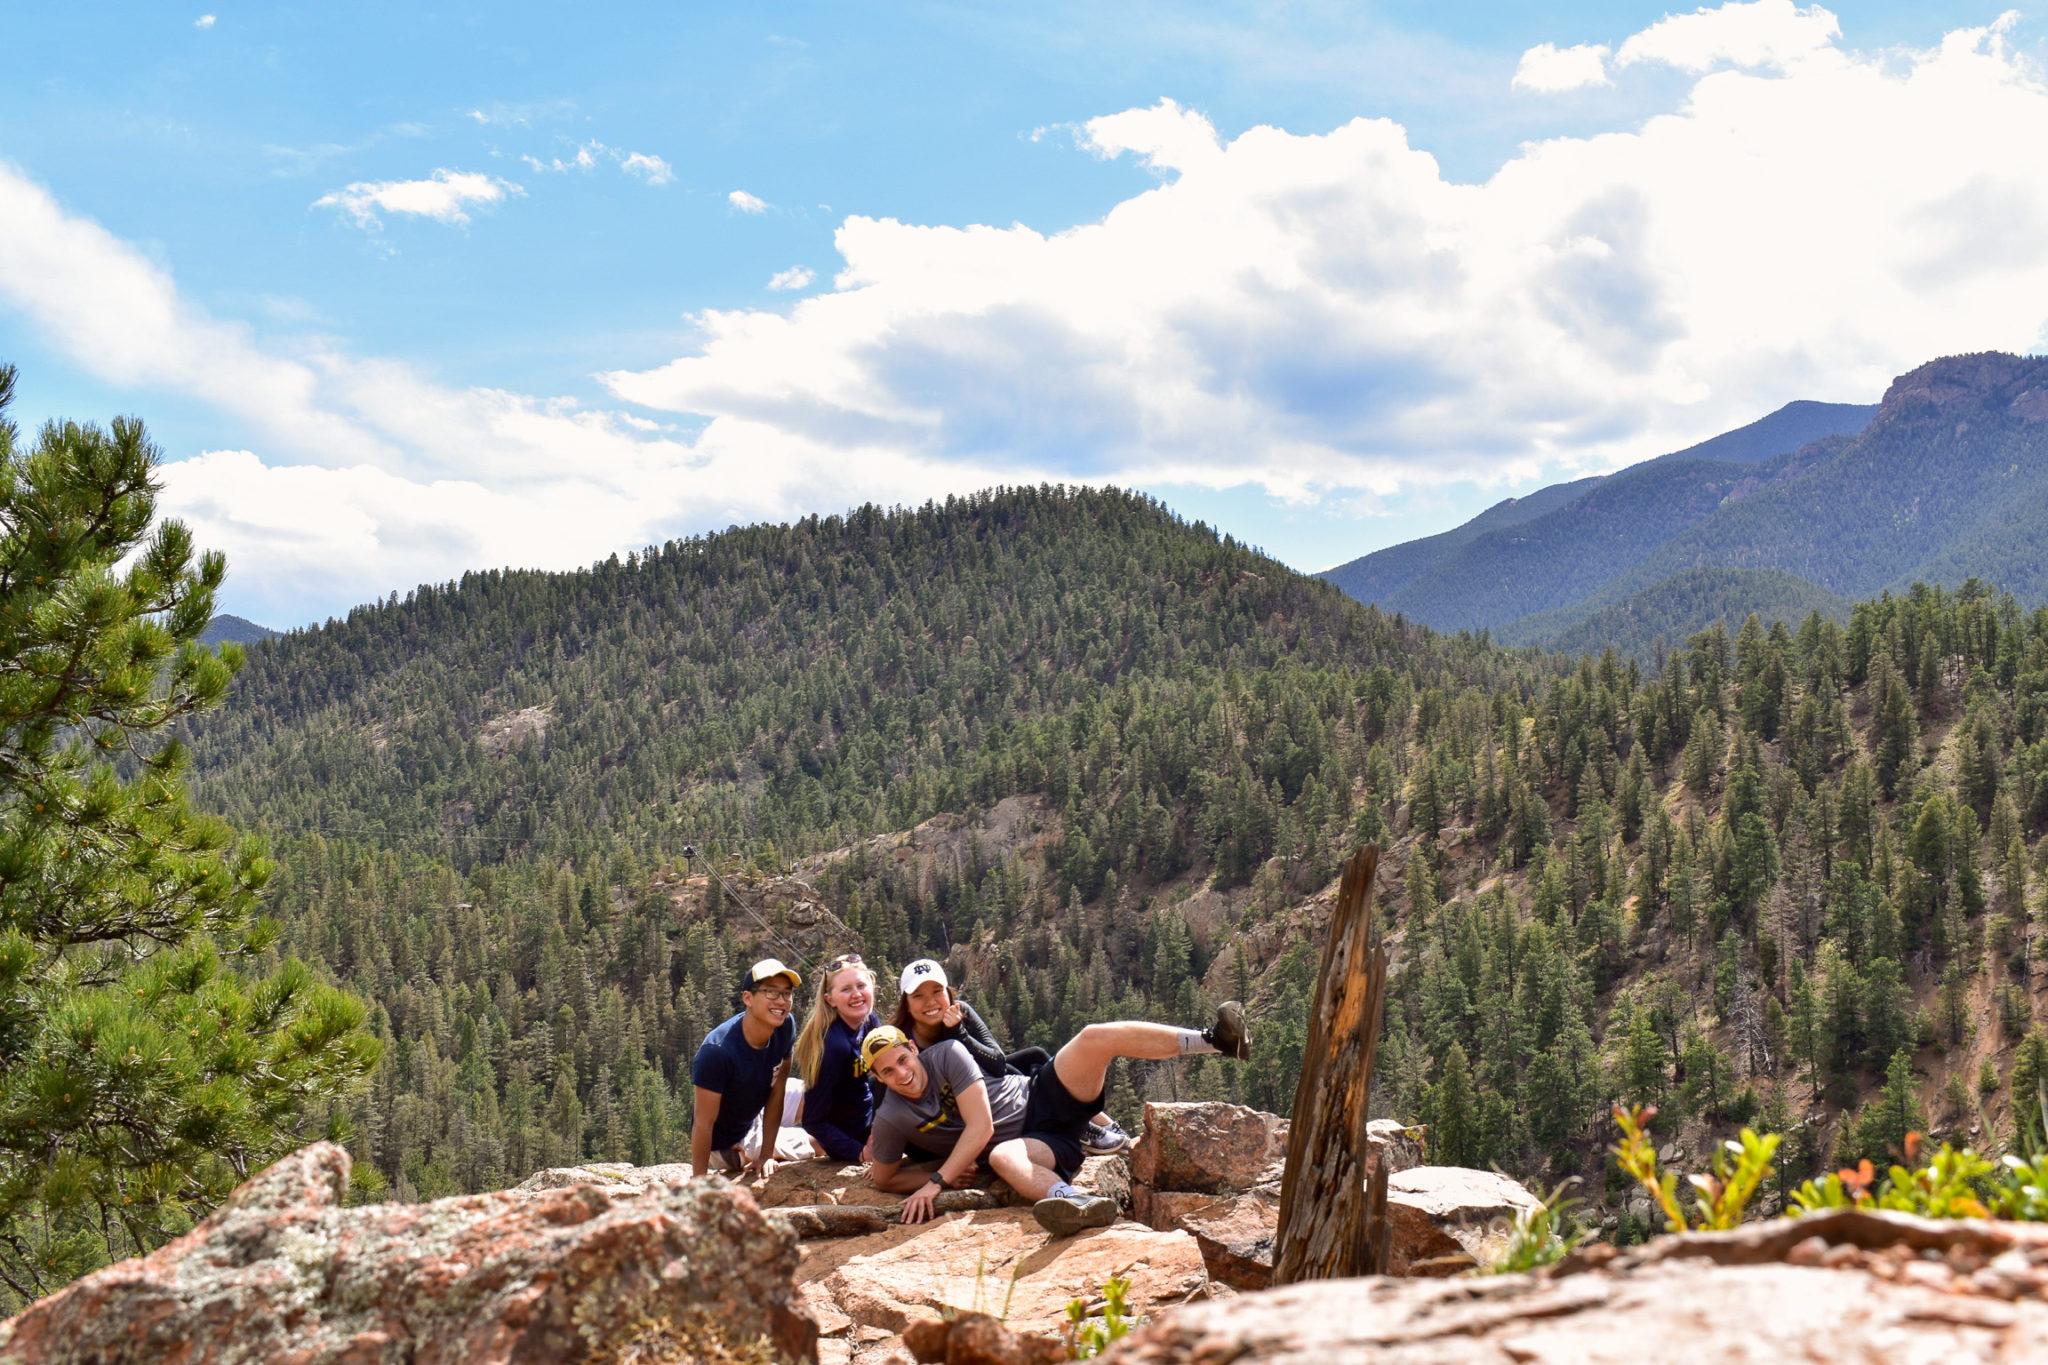 Colorado springs freebies